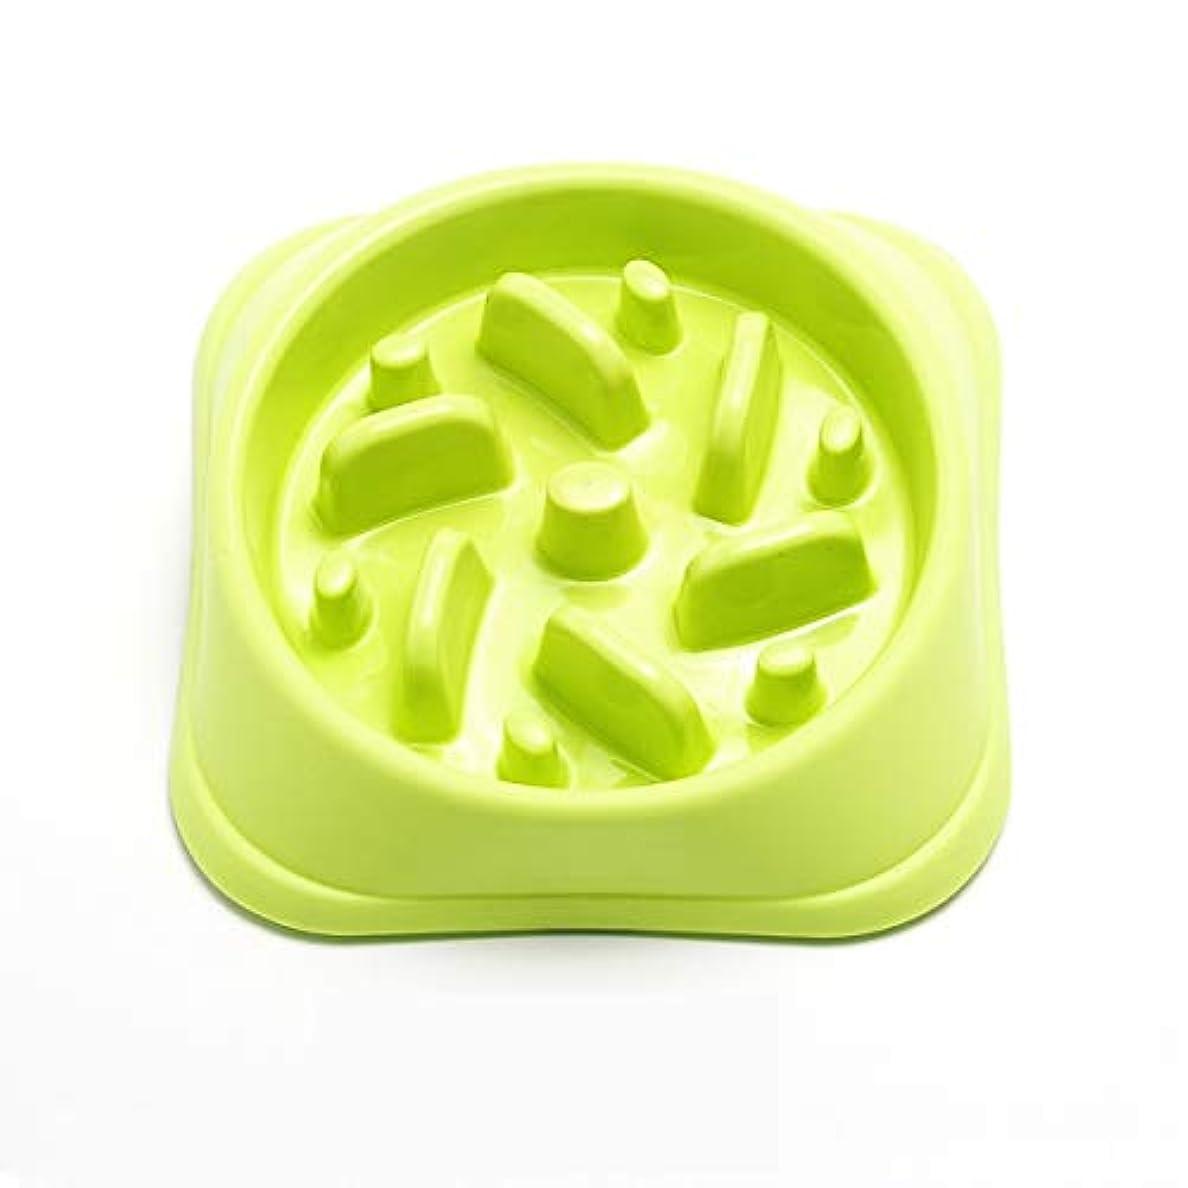 Xian 犬のボウル、スマッシュ防止スローフィードキャットボウル犬のボウル、犬用品、ペットフィーダー、ペットボウル、シングルボウルドッグフードボウル、ブルー、グリーン、パウダー、3色 Easy to Clean Non-Skid Bowls for Dogs (Color : Green)